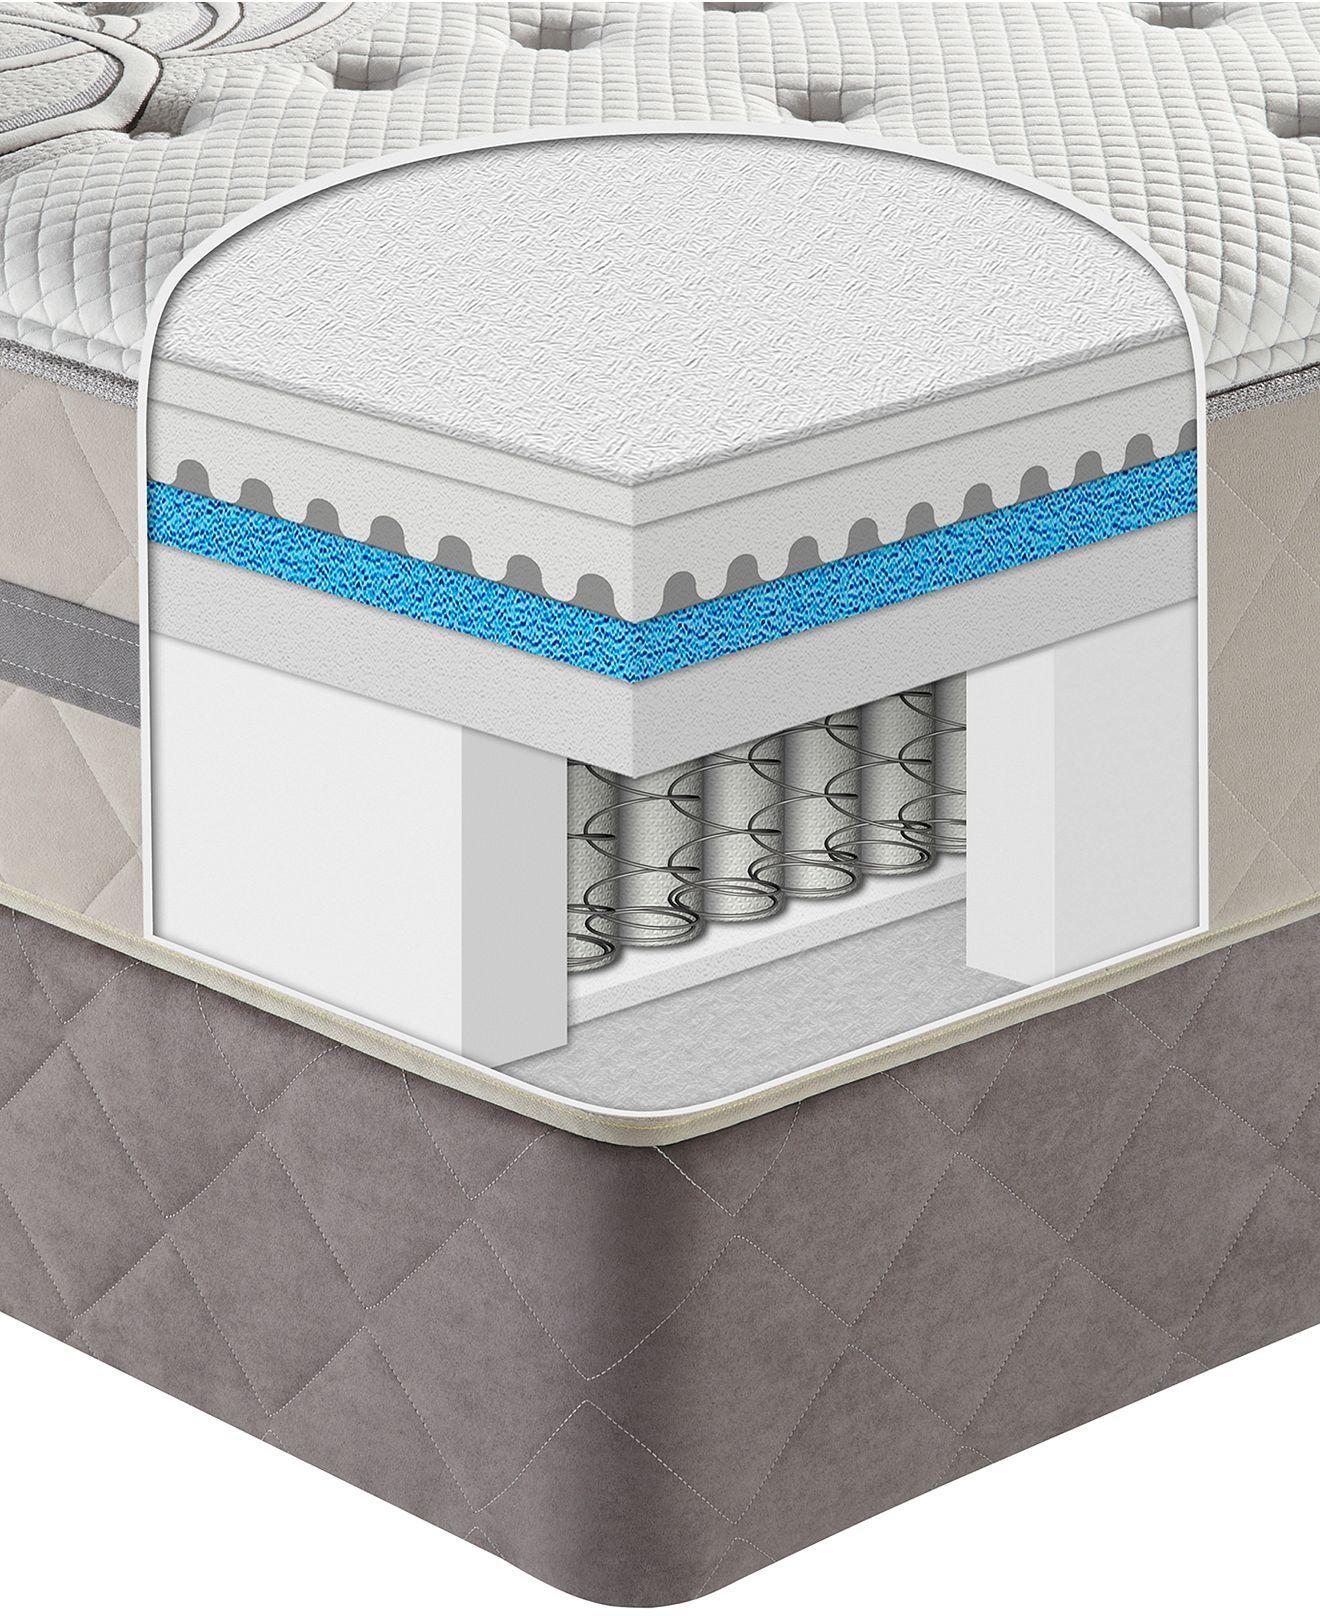 Sealy Posturepedic Hybrid Queen Split Mattress Set